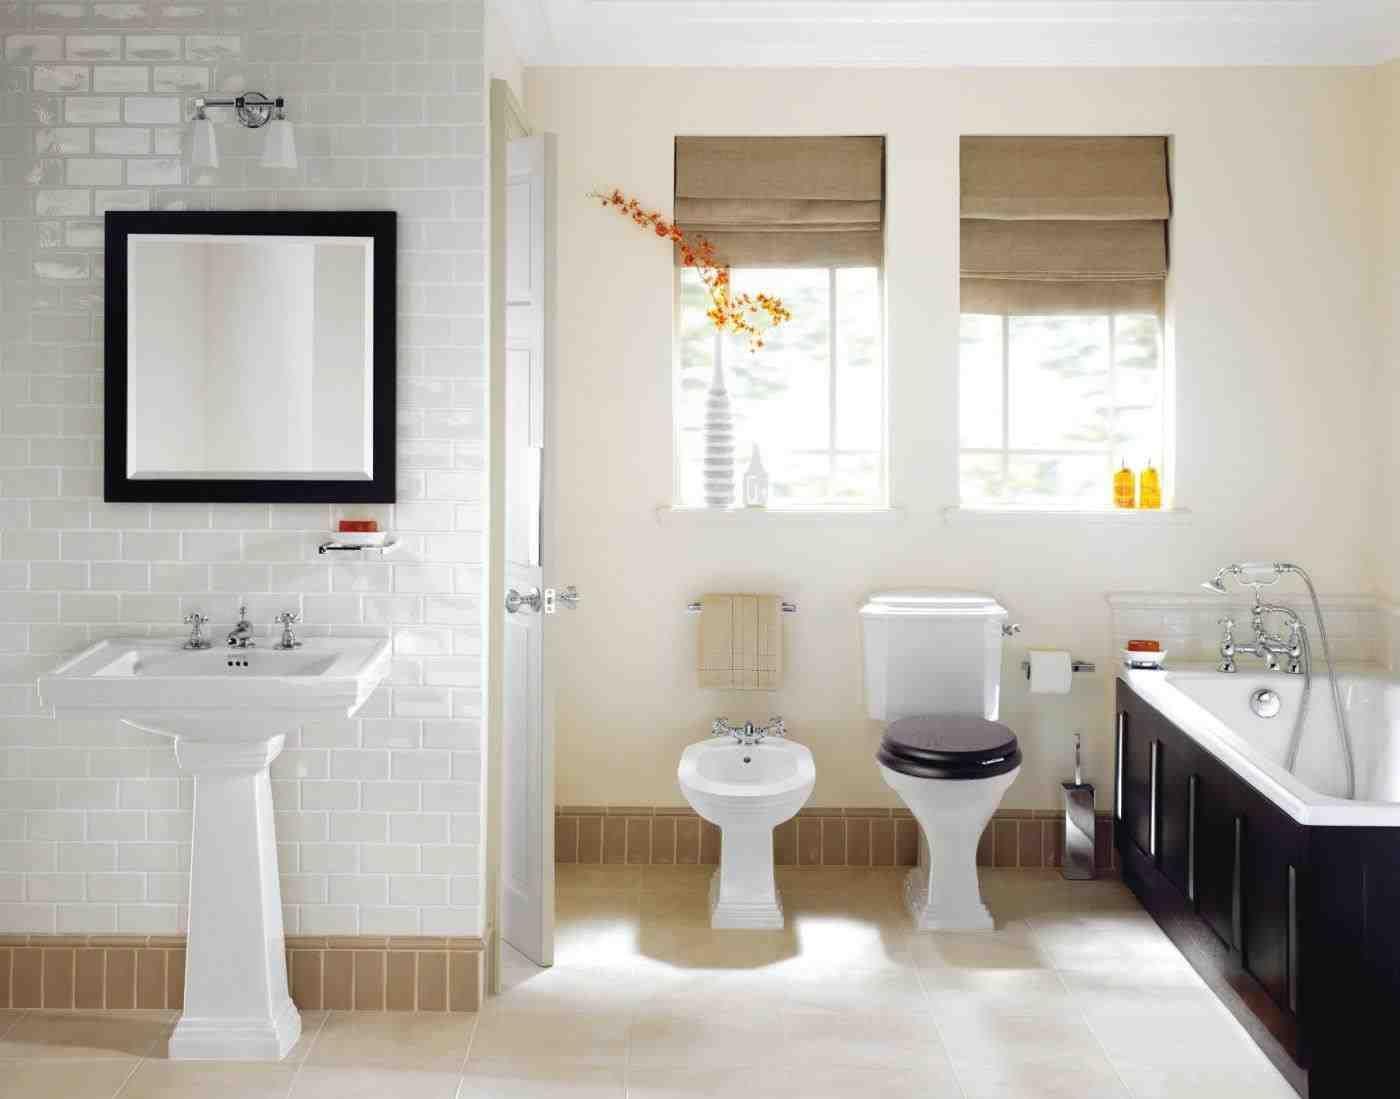 This modern bathroom accessories decorating ideas - bathroom ...